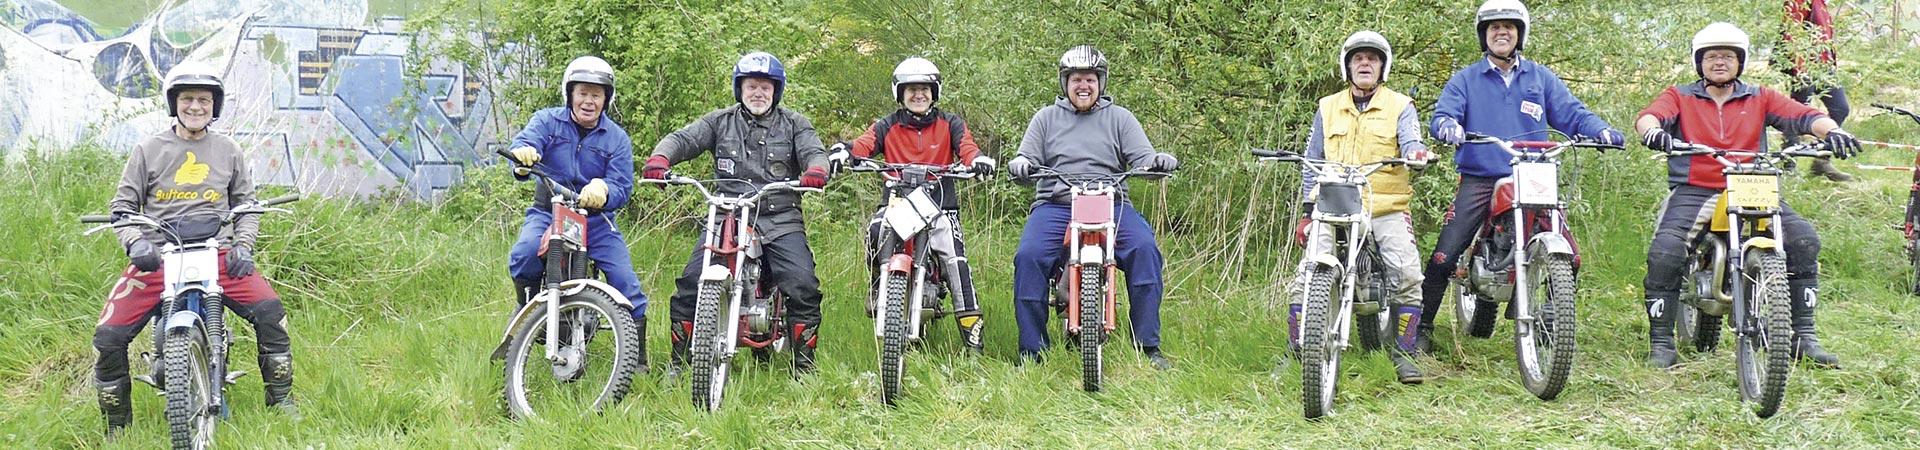 Titelbild-Classic-Trial-Bultaco-Opa-und-Freunde_27-05-2021_3ef80